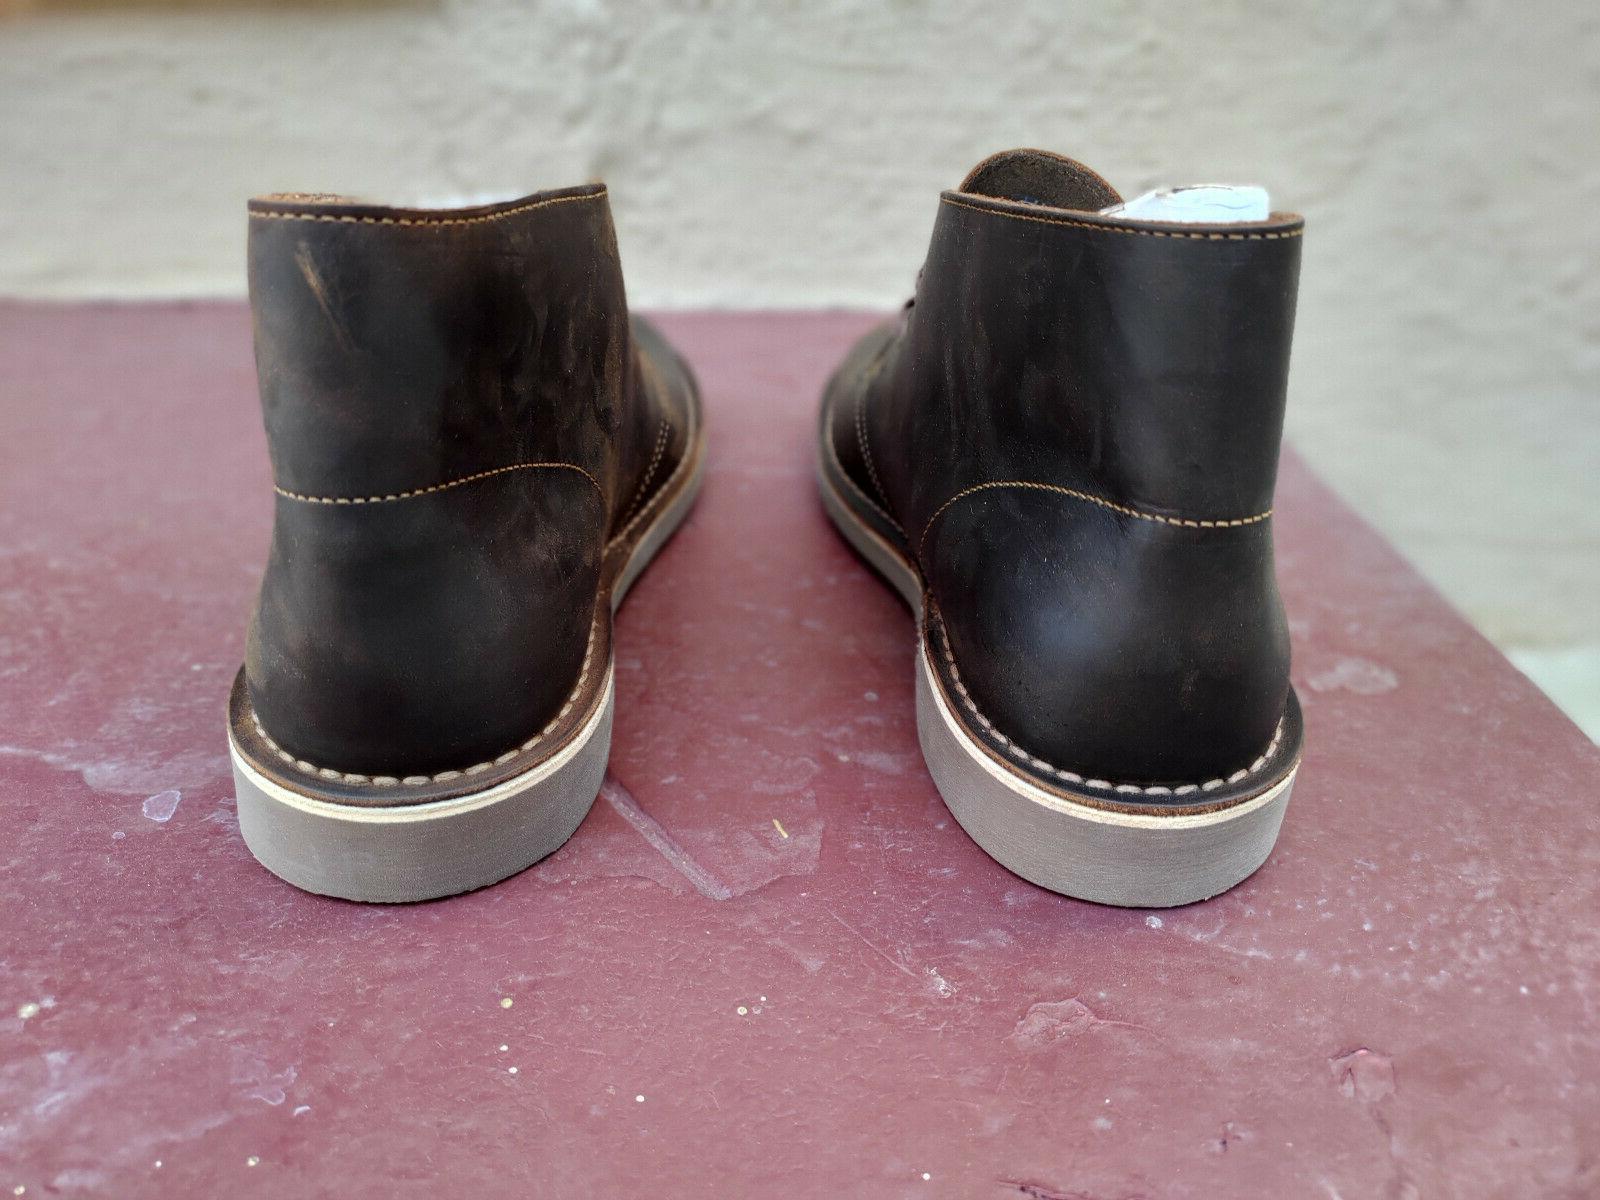 Clarks Men's Chukka Boot - sizes available